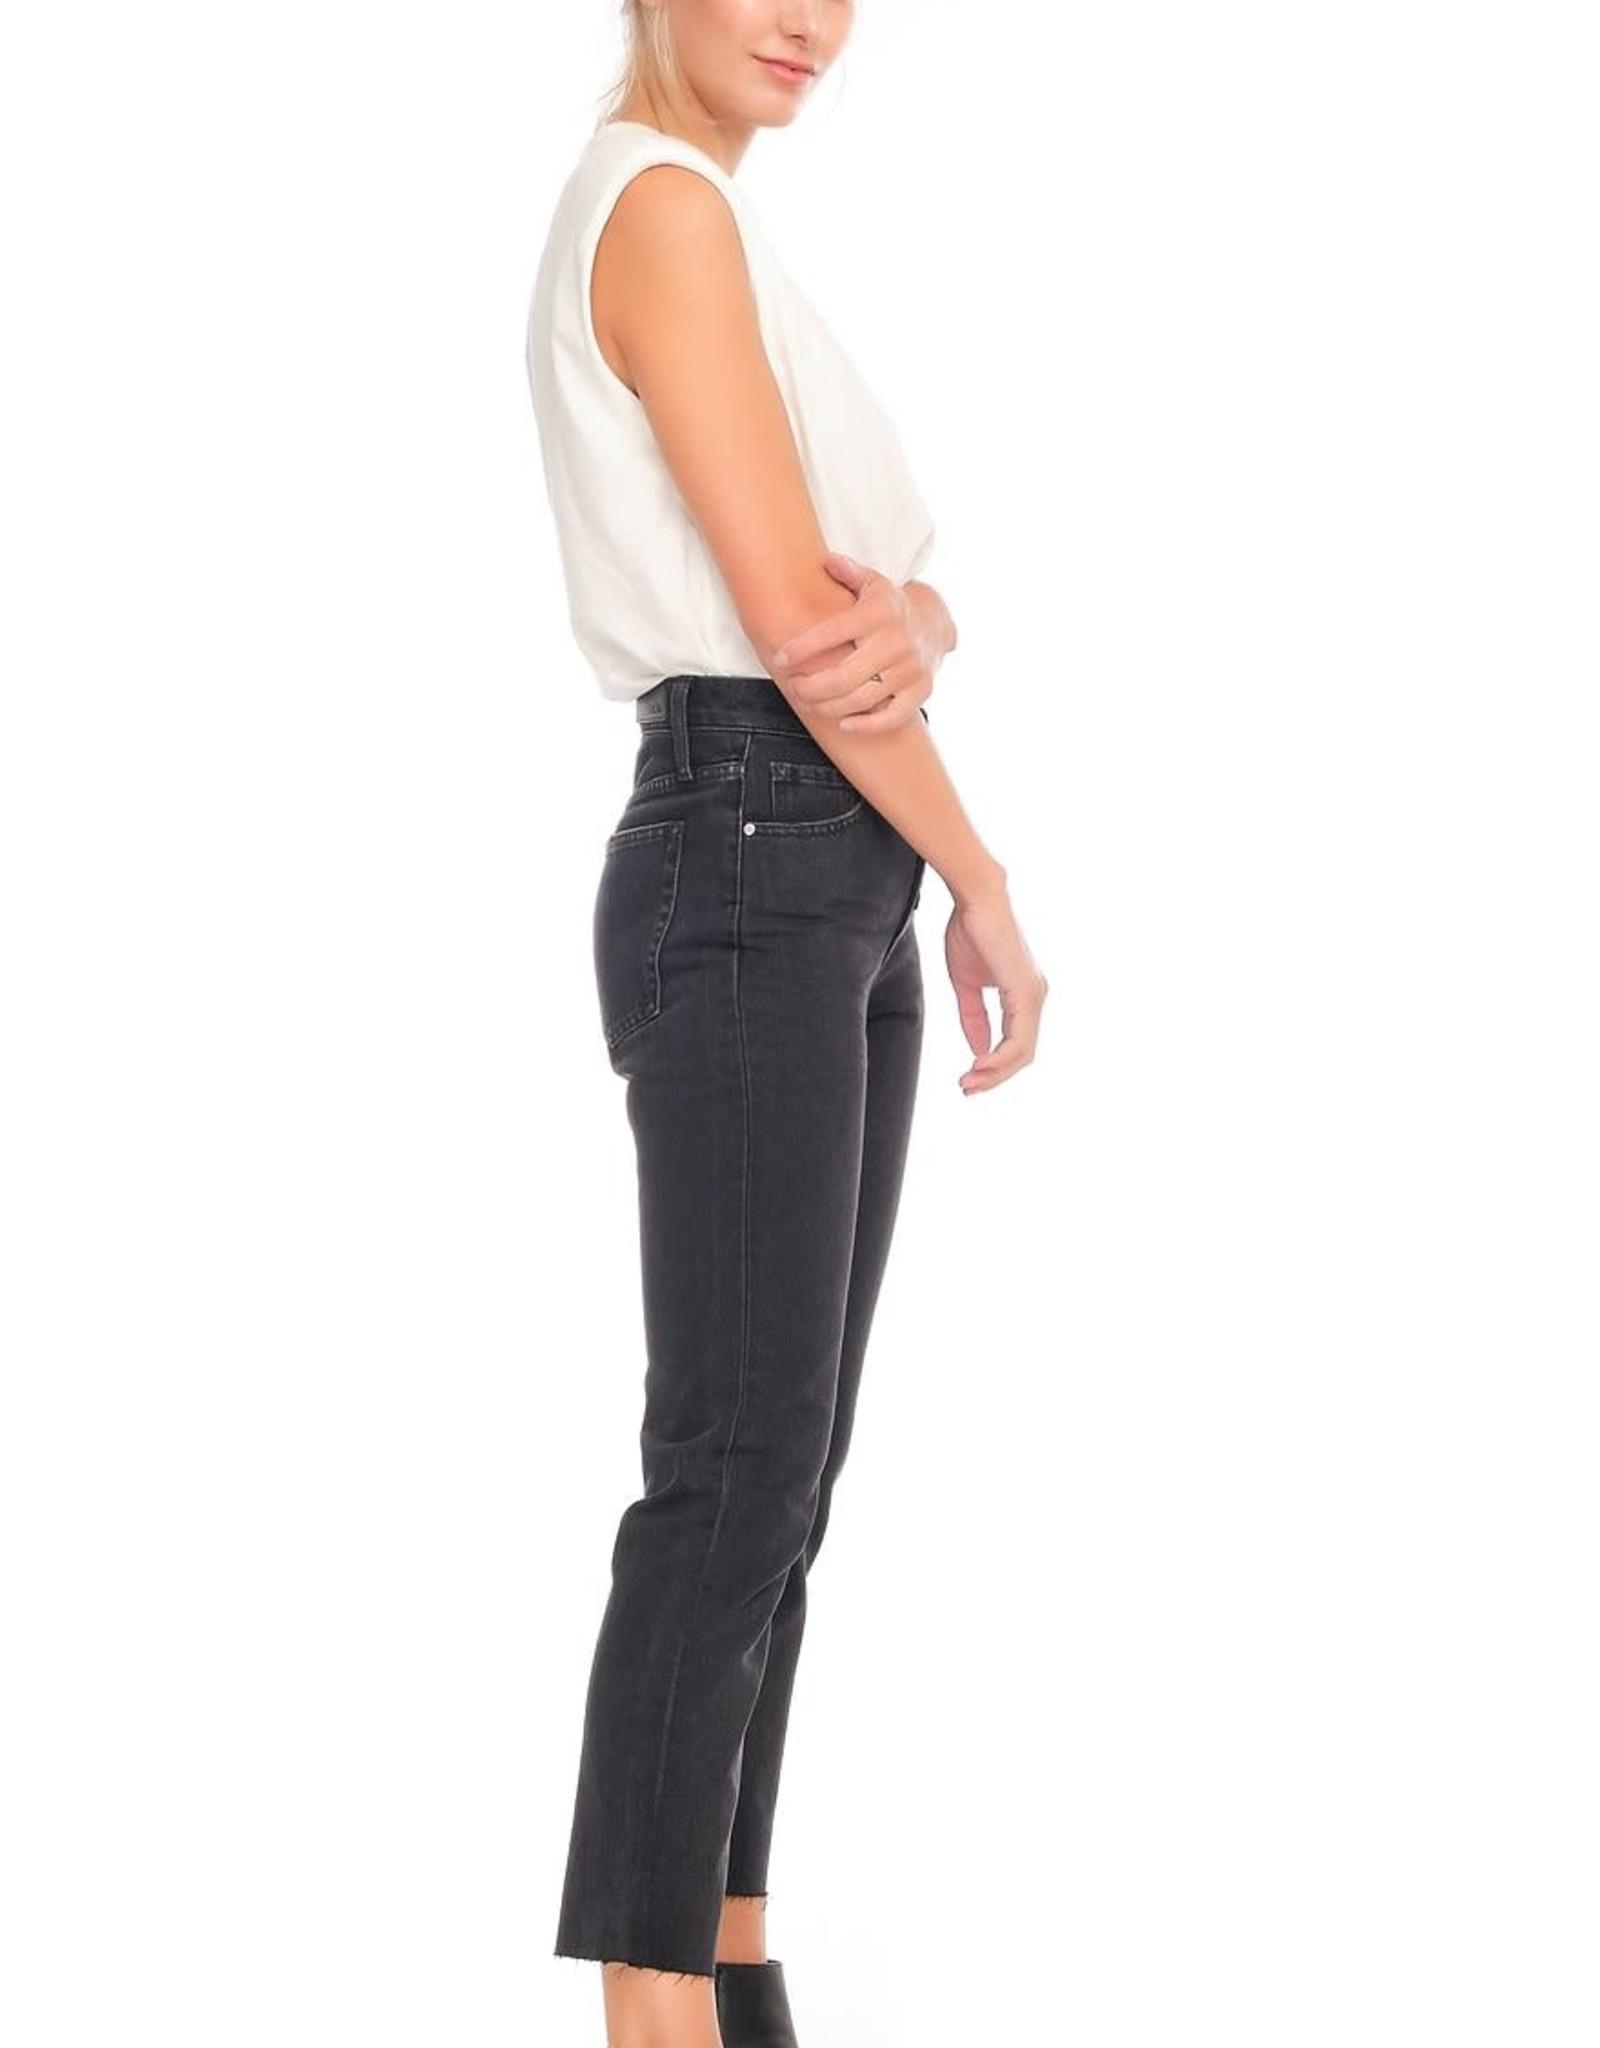 F.A.M. Jeans F.A.M. 'Patricia'- Black